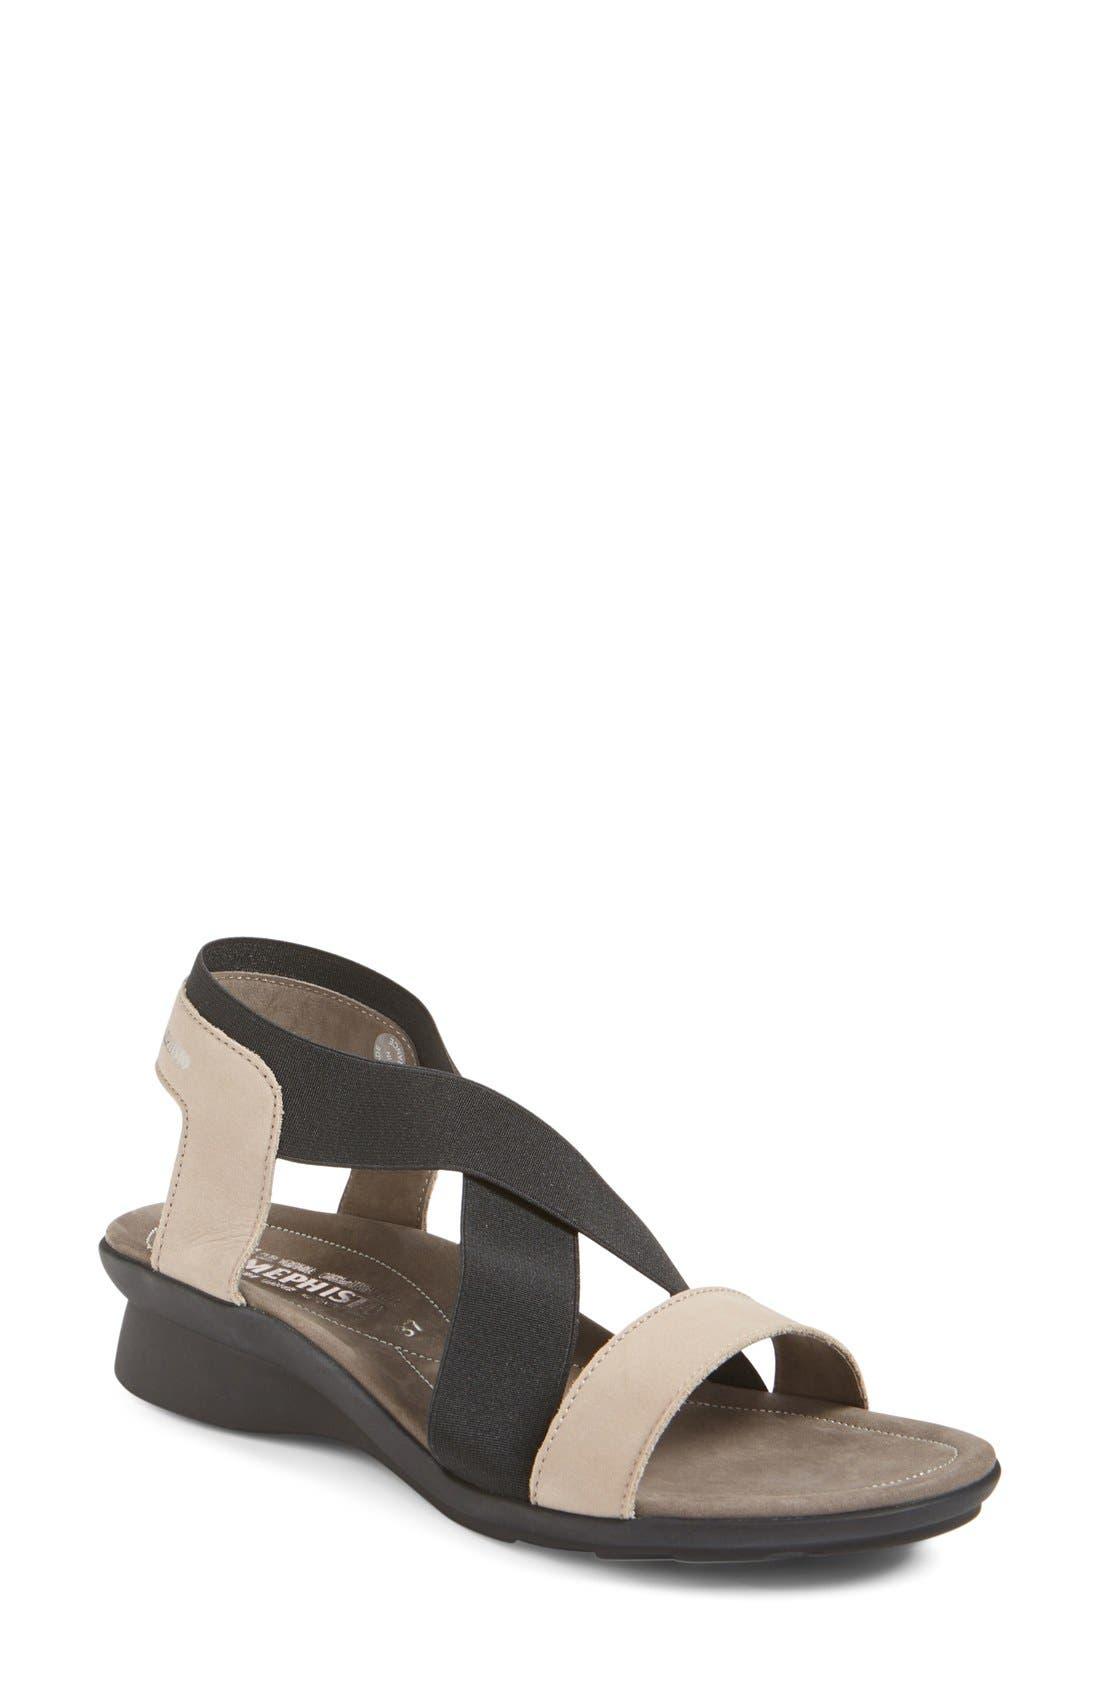 'Pastora' Sandal,                             Main thumbnail 1, color,                             Warm Grey